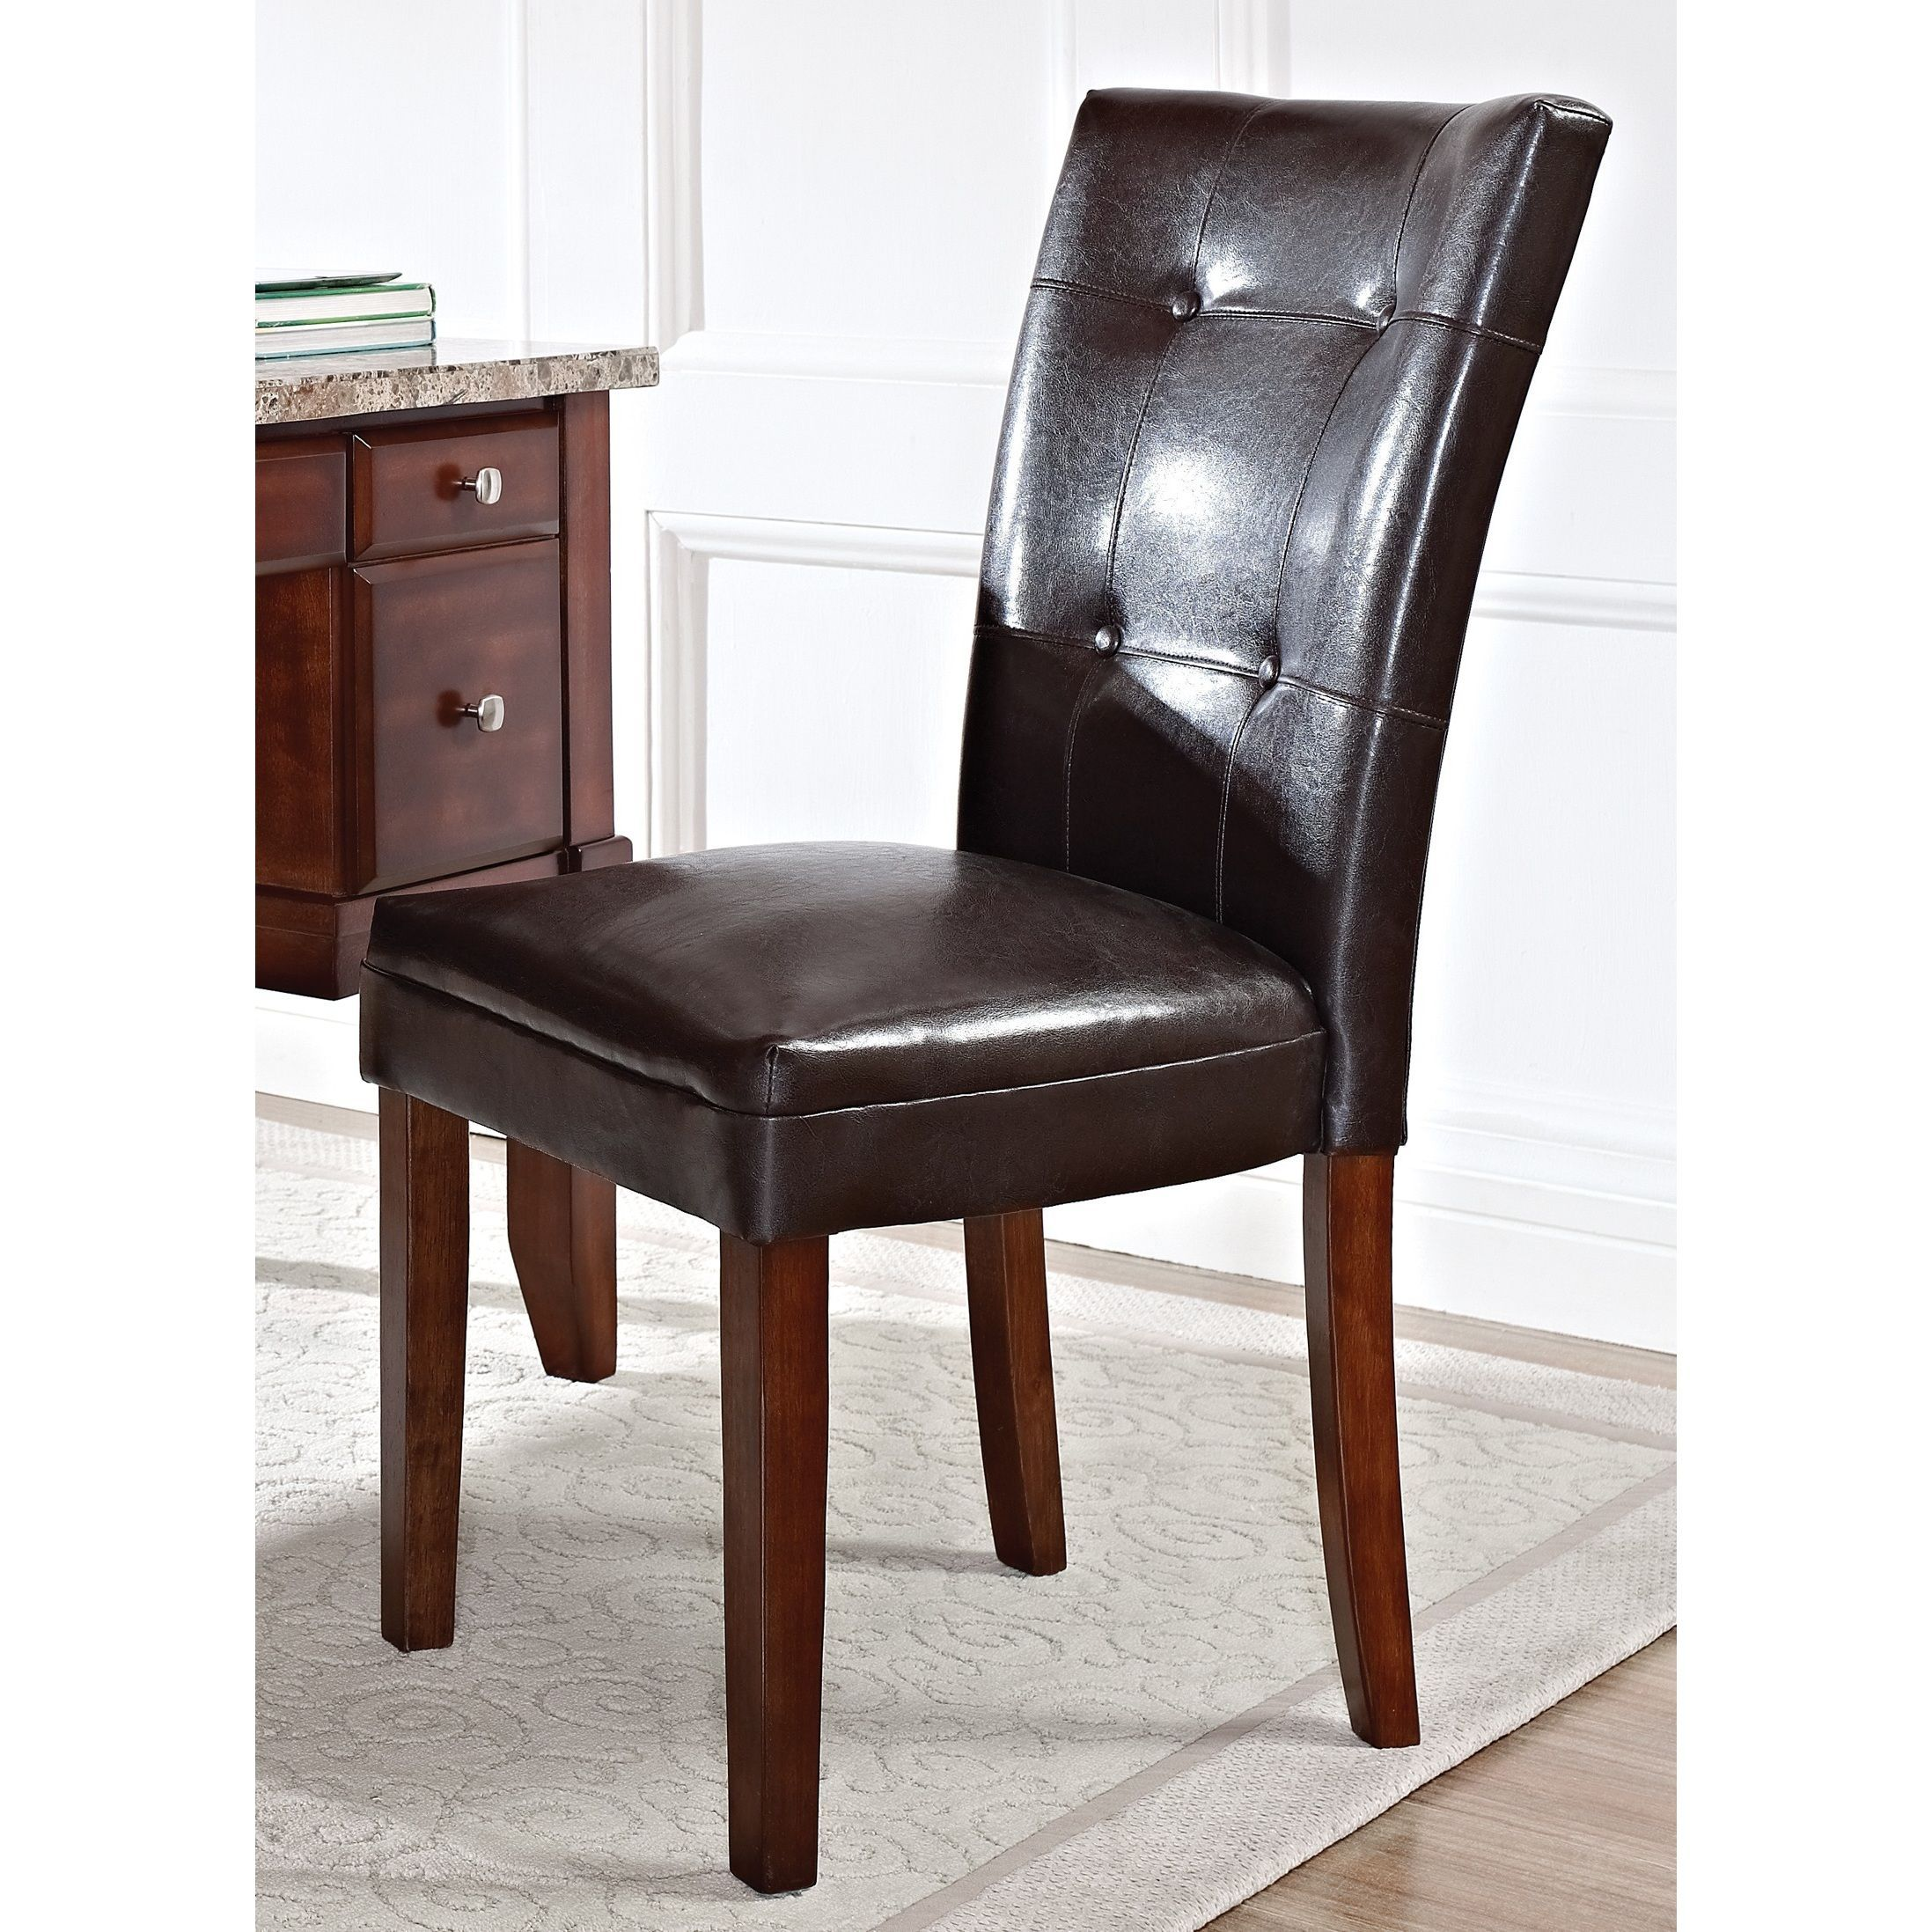 Super Melbourne Medium Cherry Faux Leather Parsons Chair By Beatyapartments Chair Design Images Beatyapartmentscom